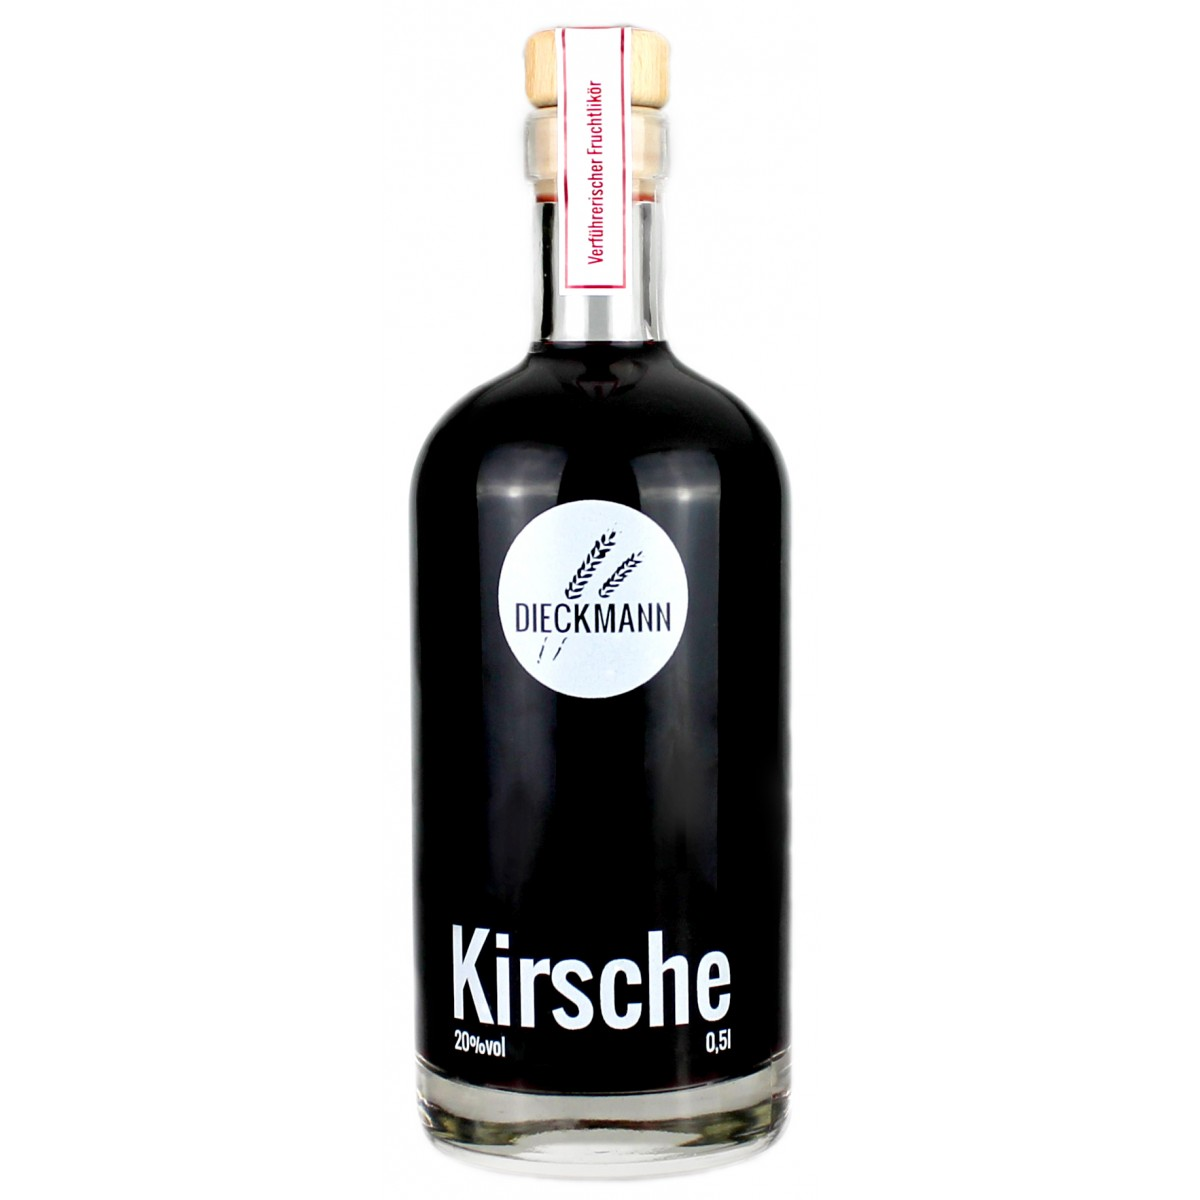 Weizenbrennerei & Likörmanufaktur Dieckmann Kirsche - Fruchtlikör LIKÖR 20%vol., 0,5l